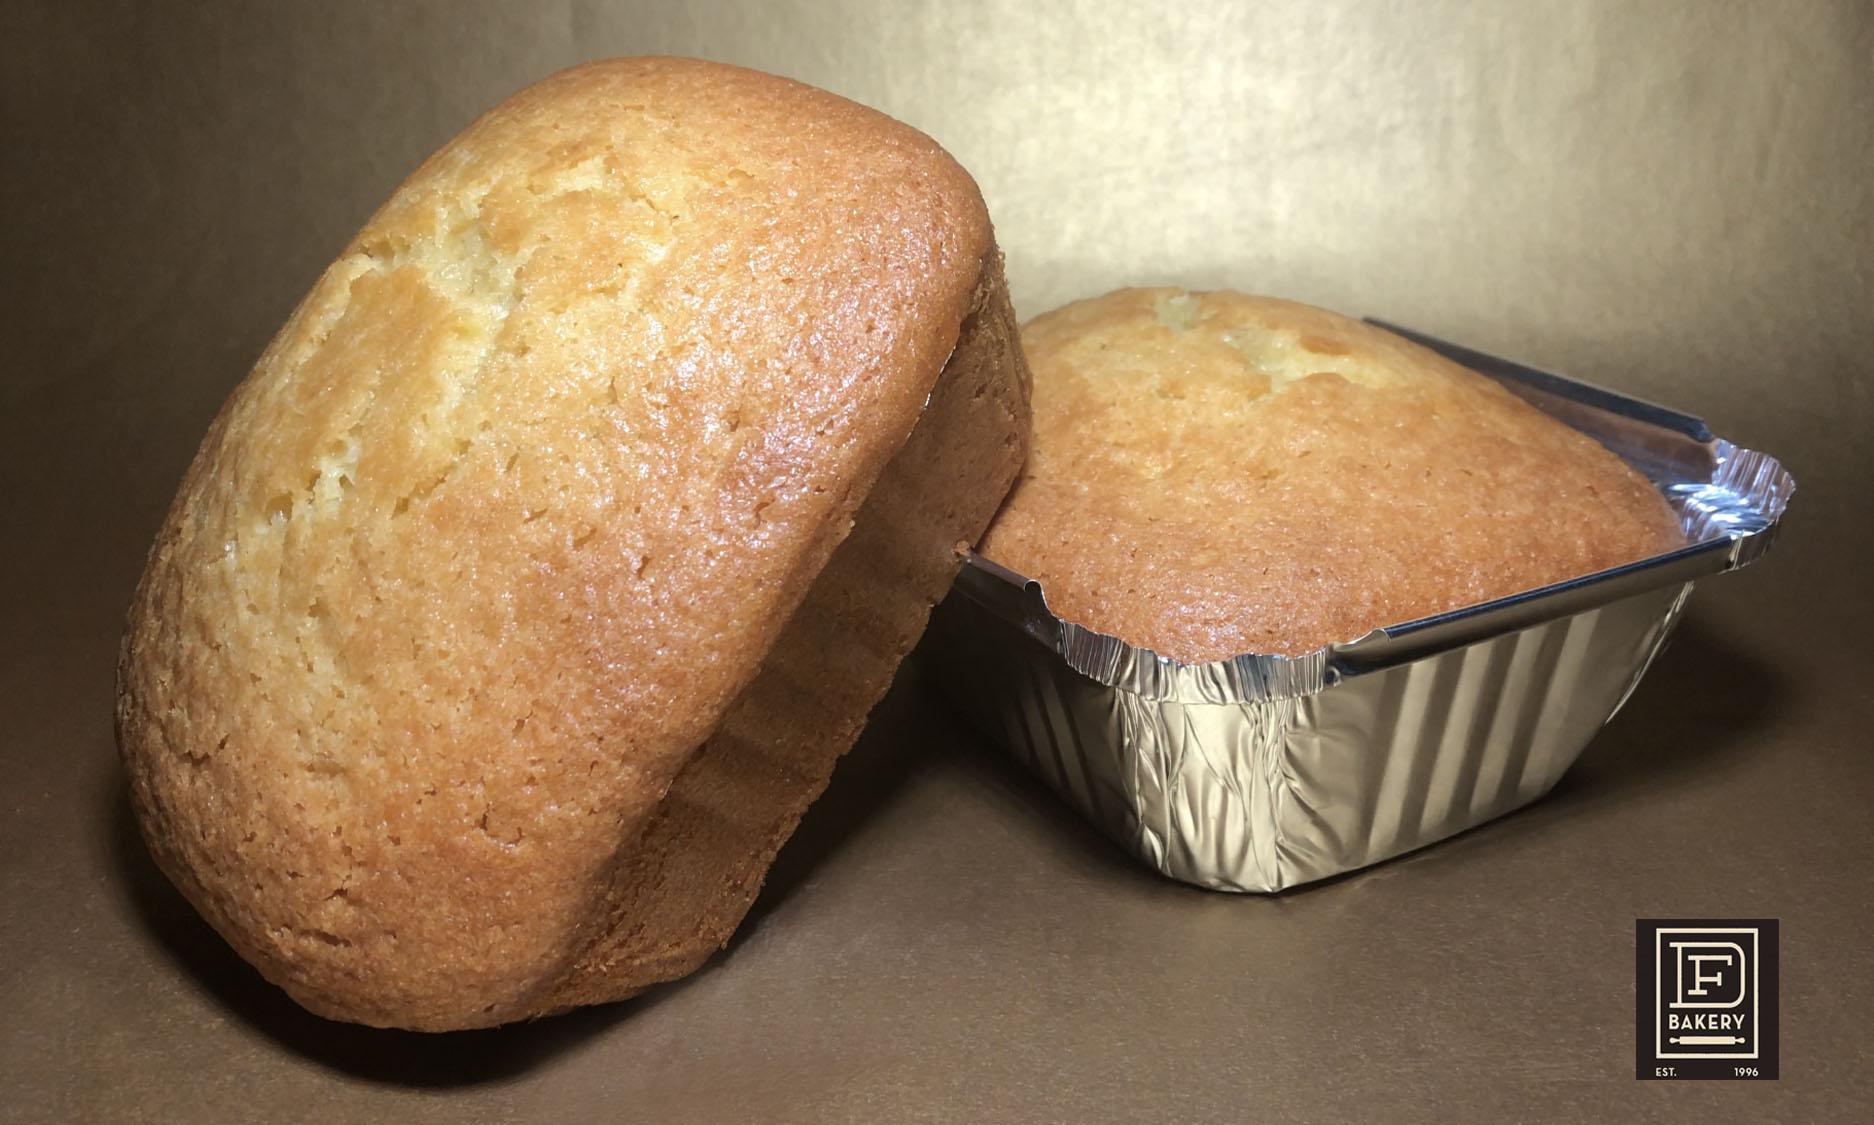 Cornbread Loaf from DF Bakery